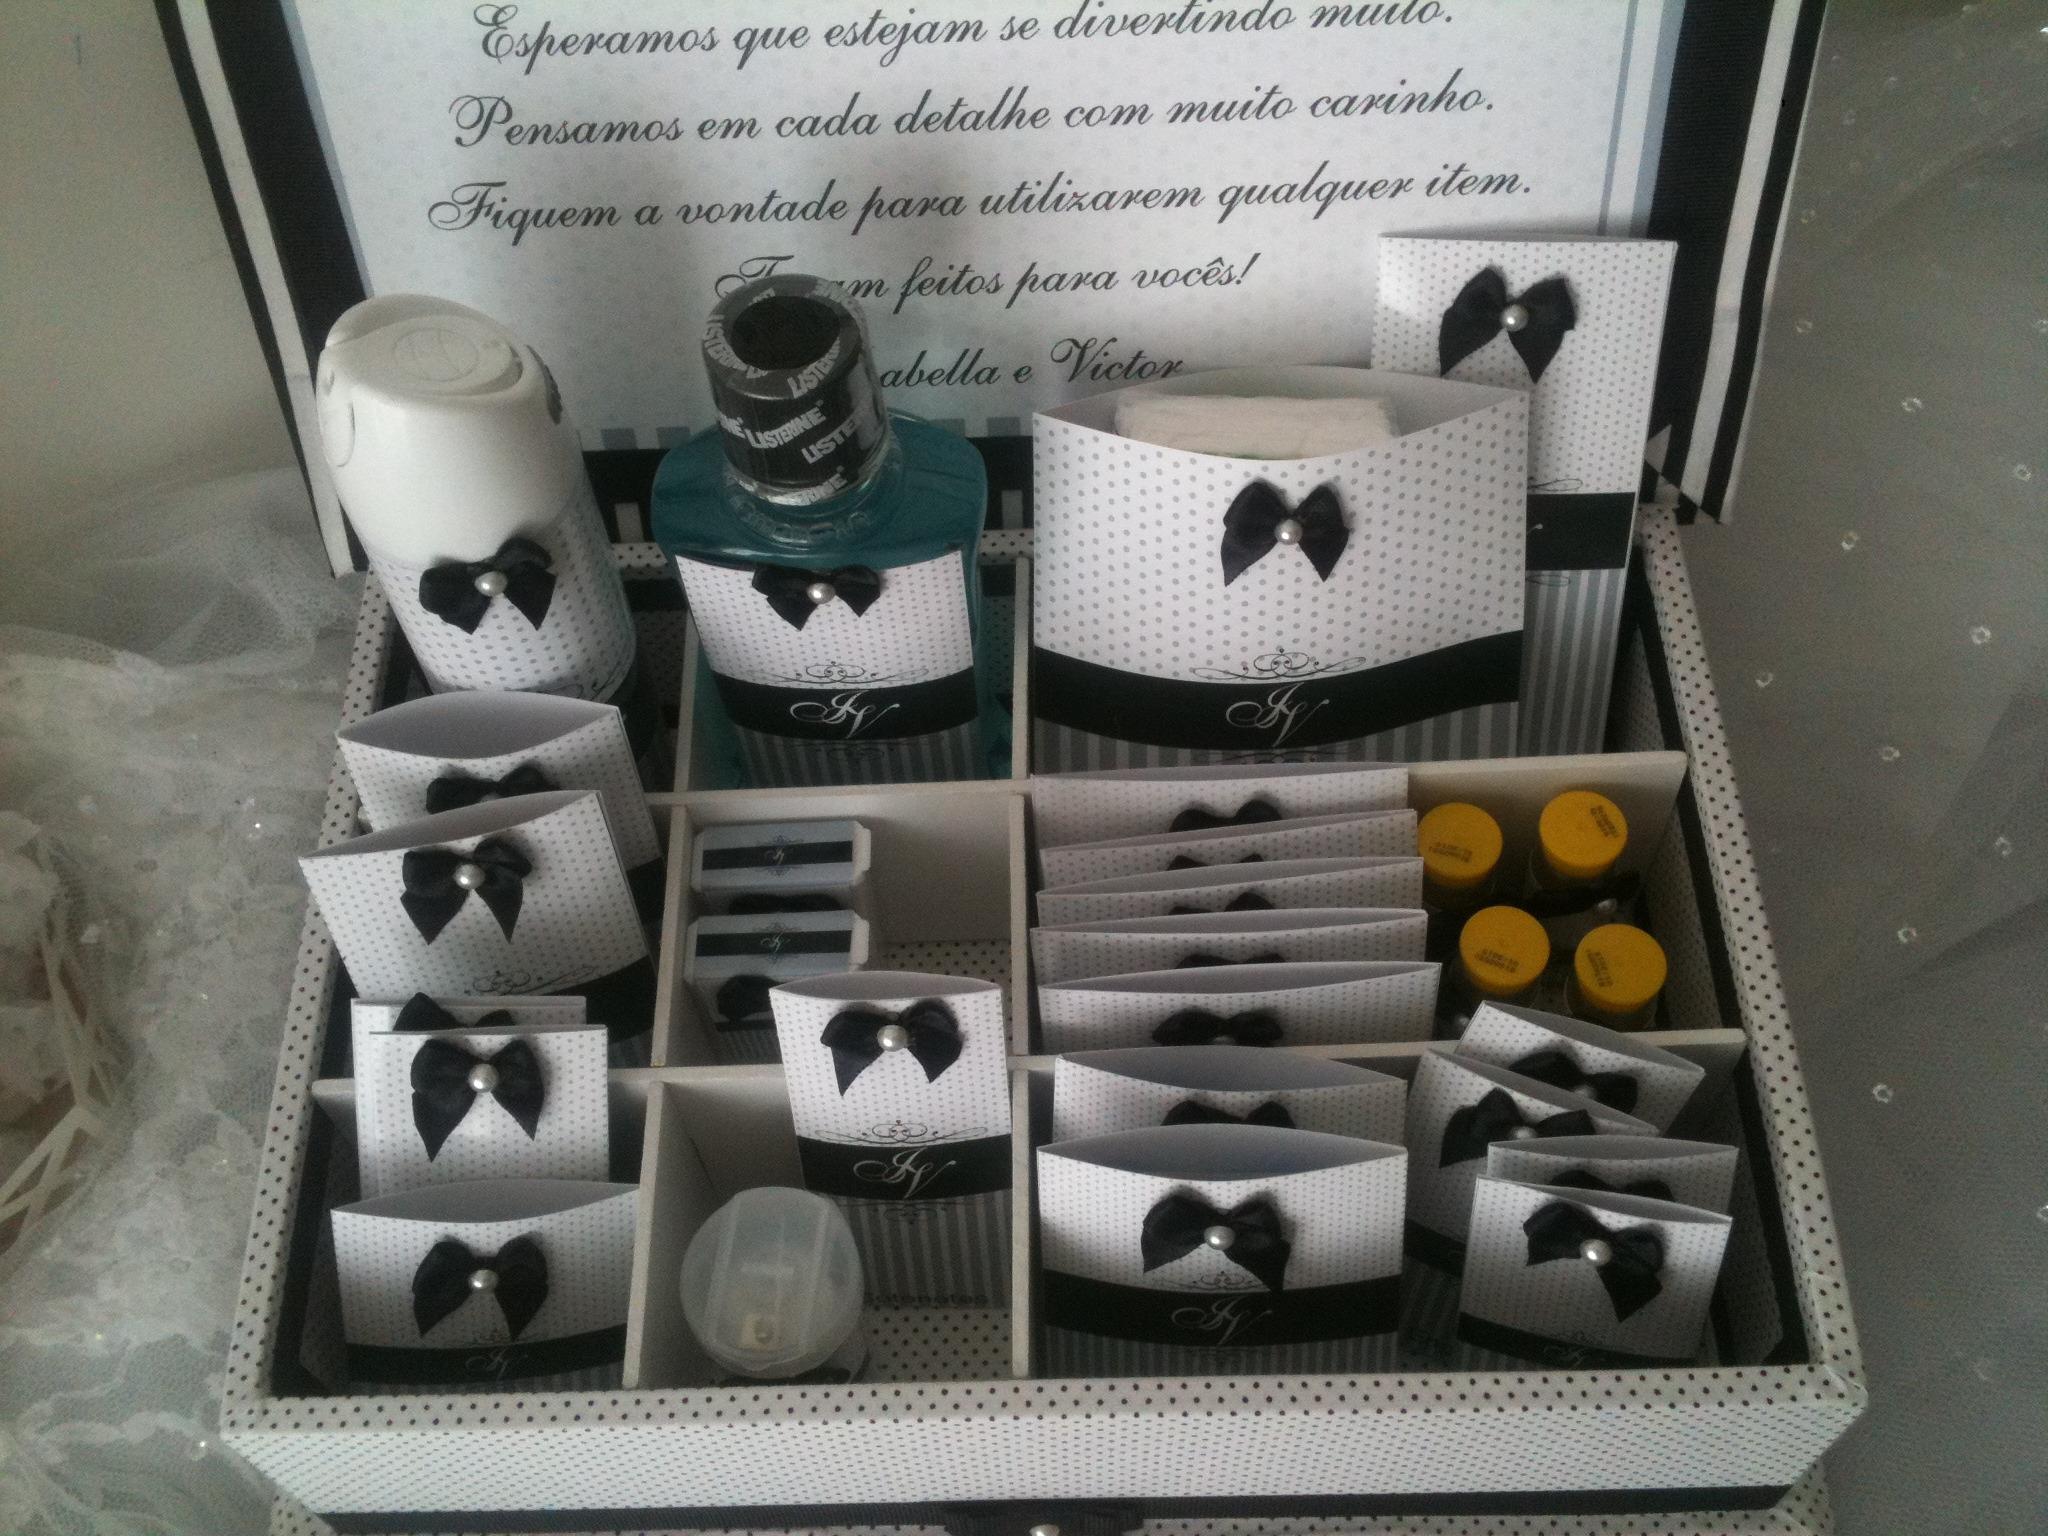 para lavabo kit toalete masculino kit toalet kit toalete masculino kit #5E5038 2048 1536